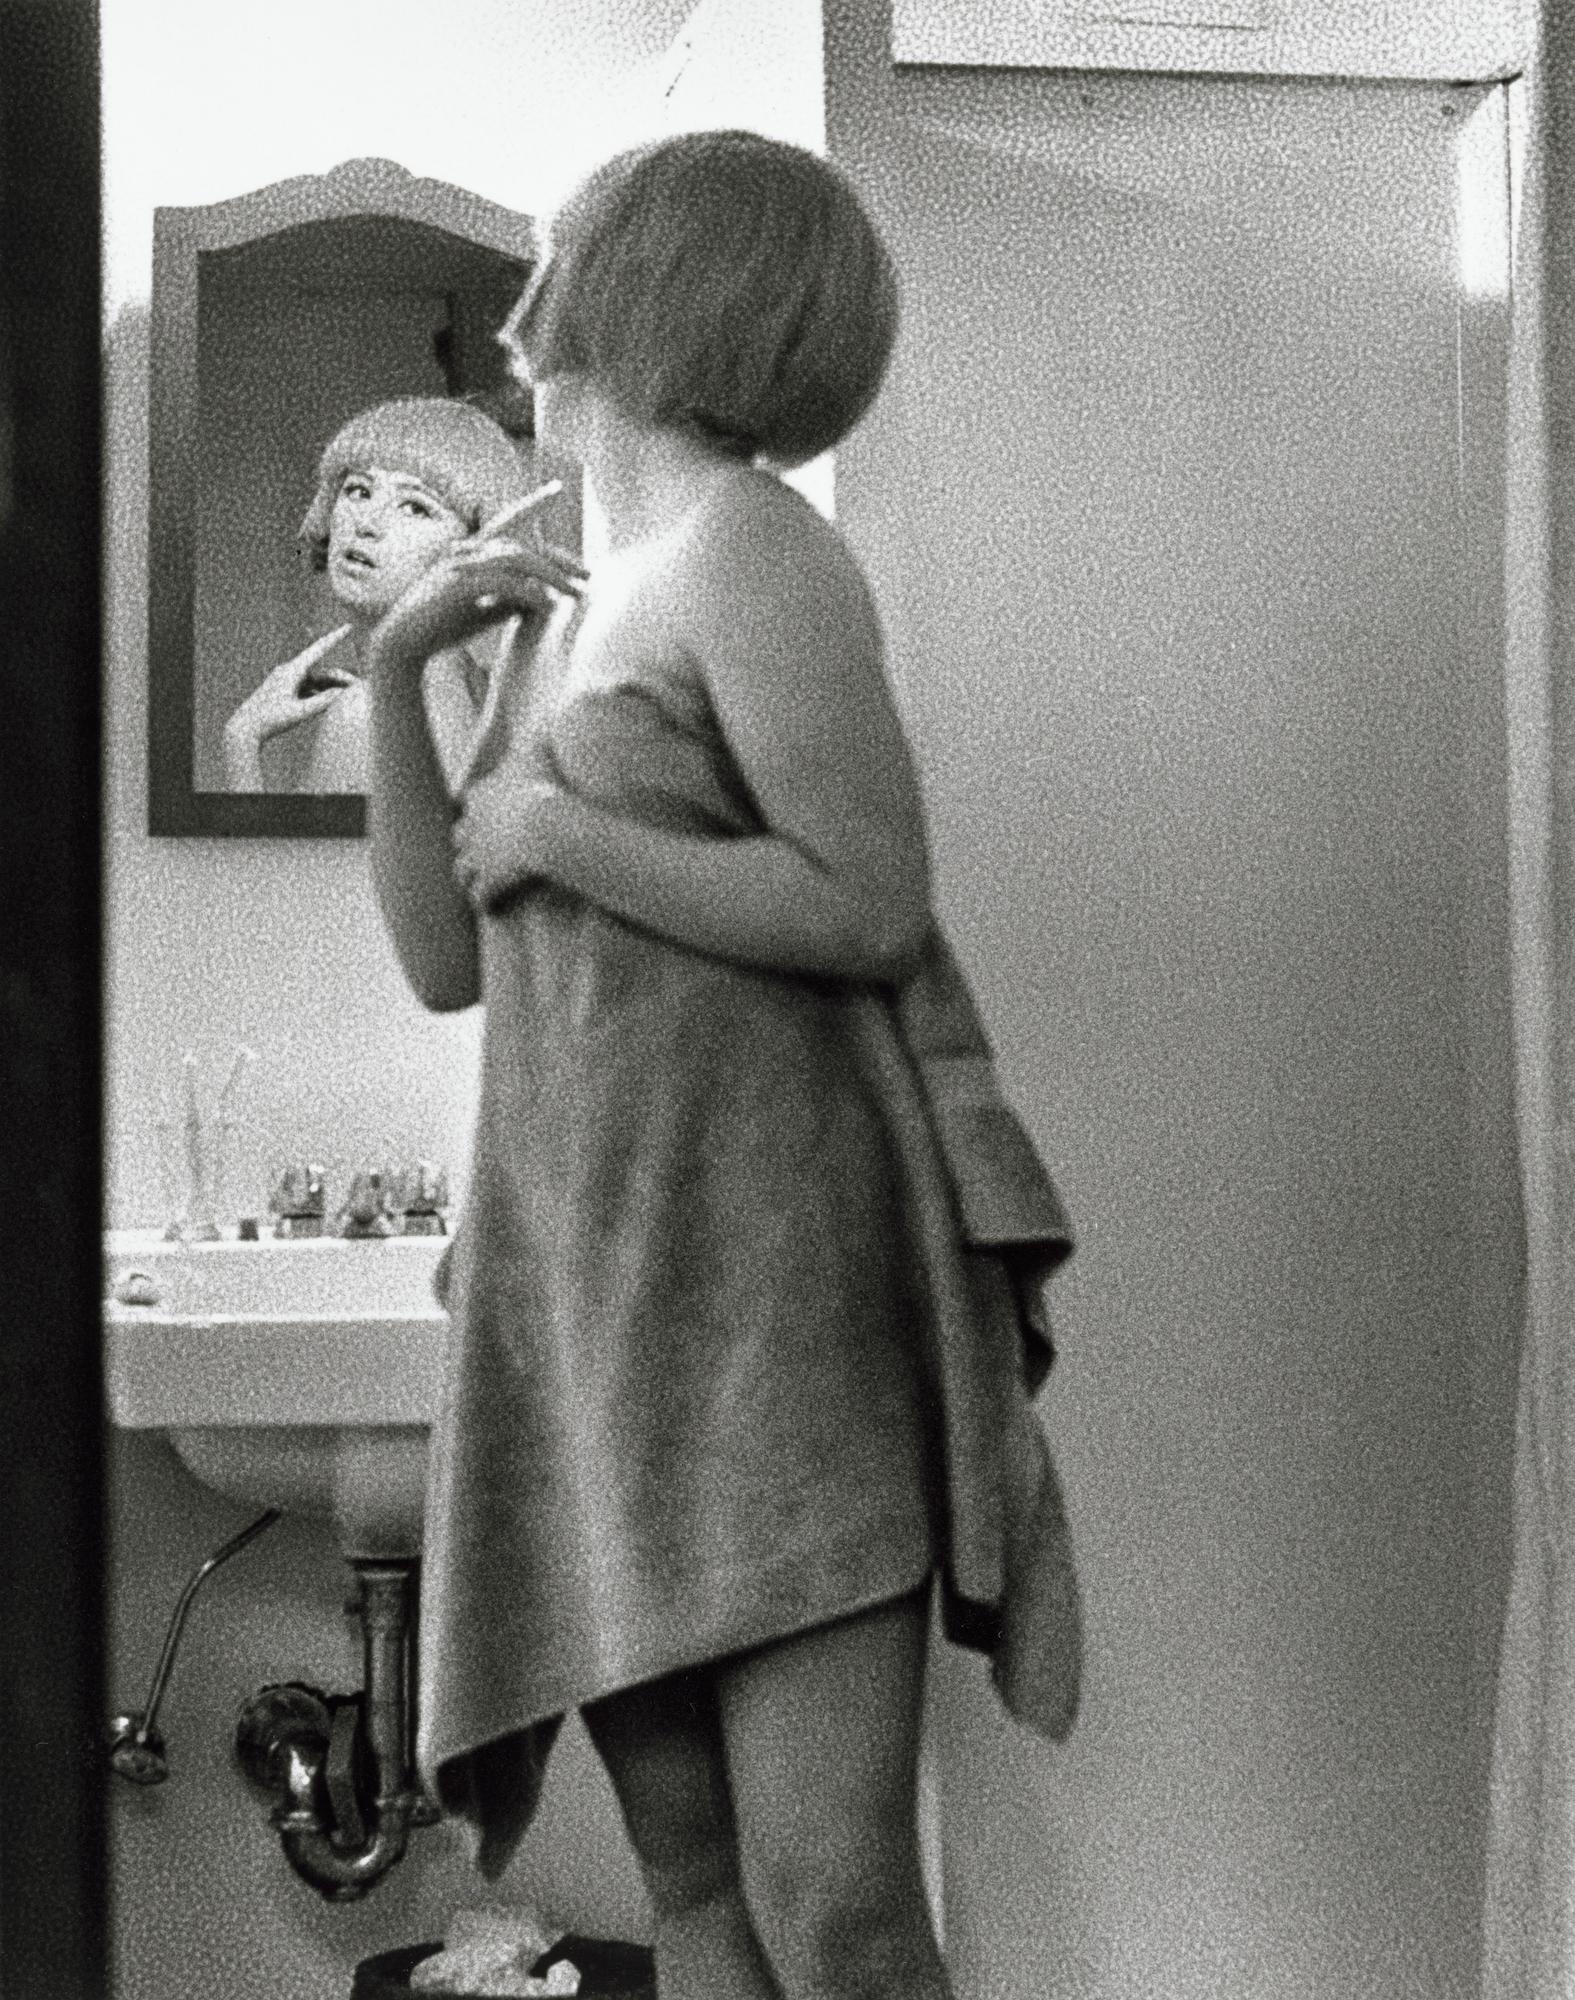 Cindy Sherman,  Untitled Film Still #2  (1977)